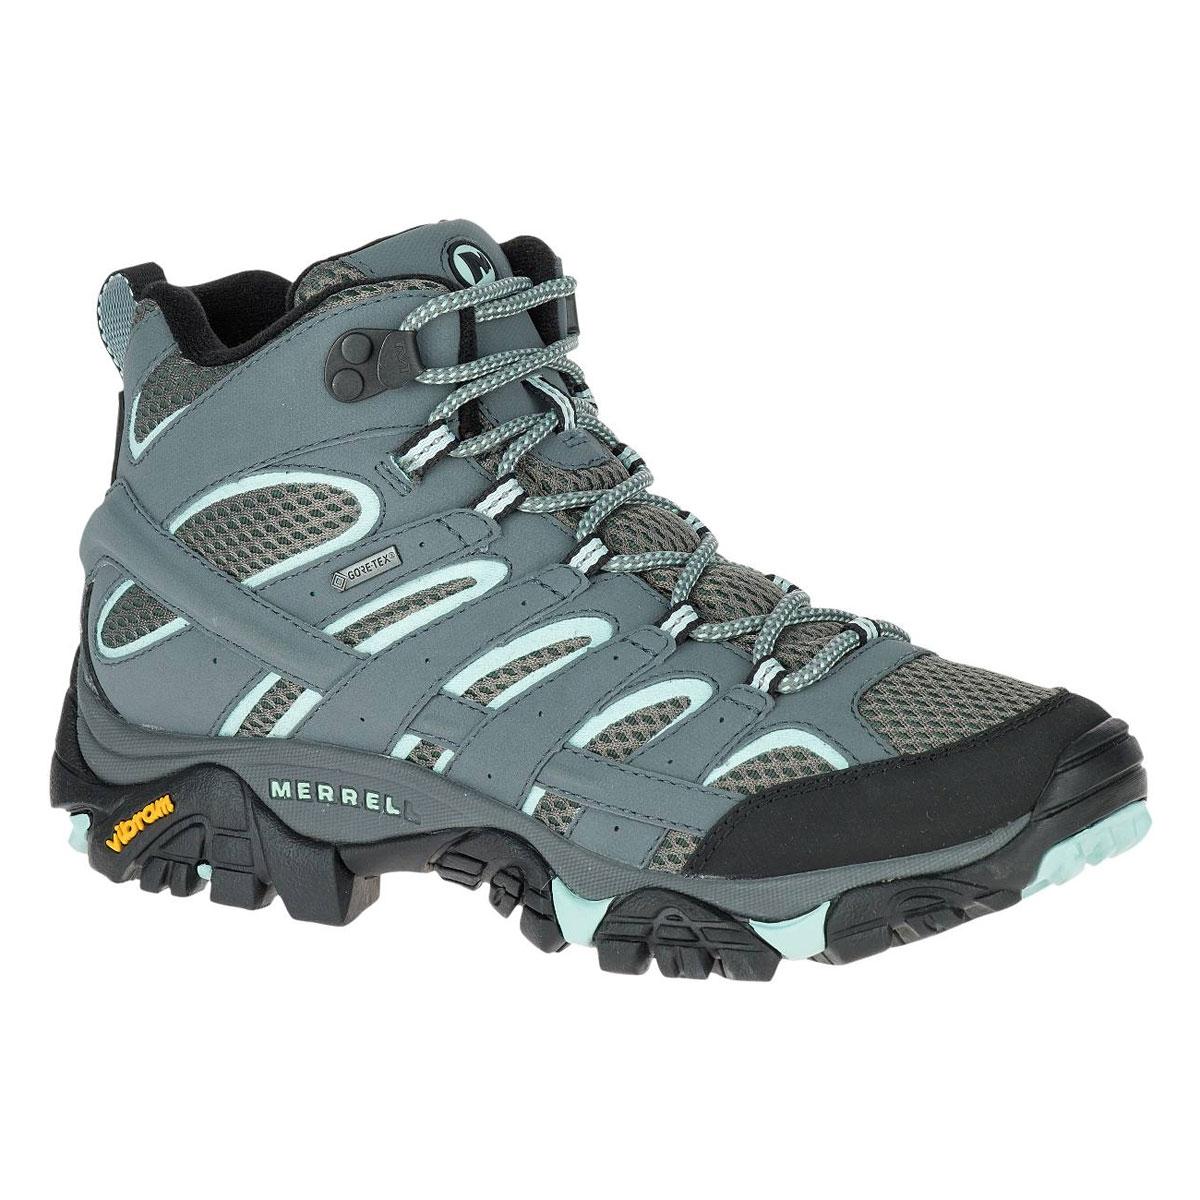 0e83ec0cc91 Merrell Moab 2 MID GTX Walking Boots (Women's) - Sedona Sage